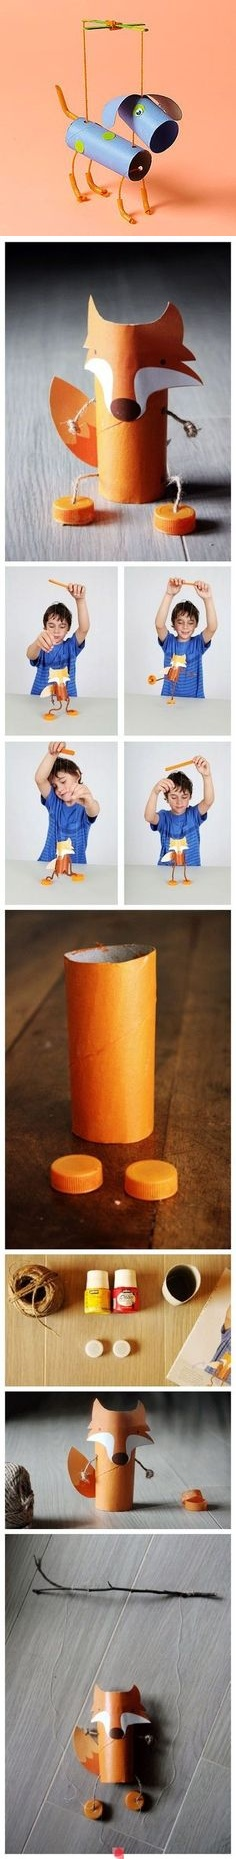 marionetka na sznurkach